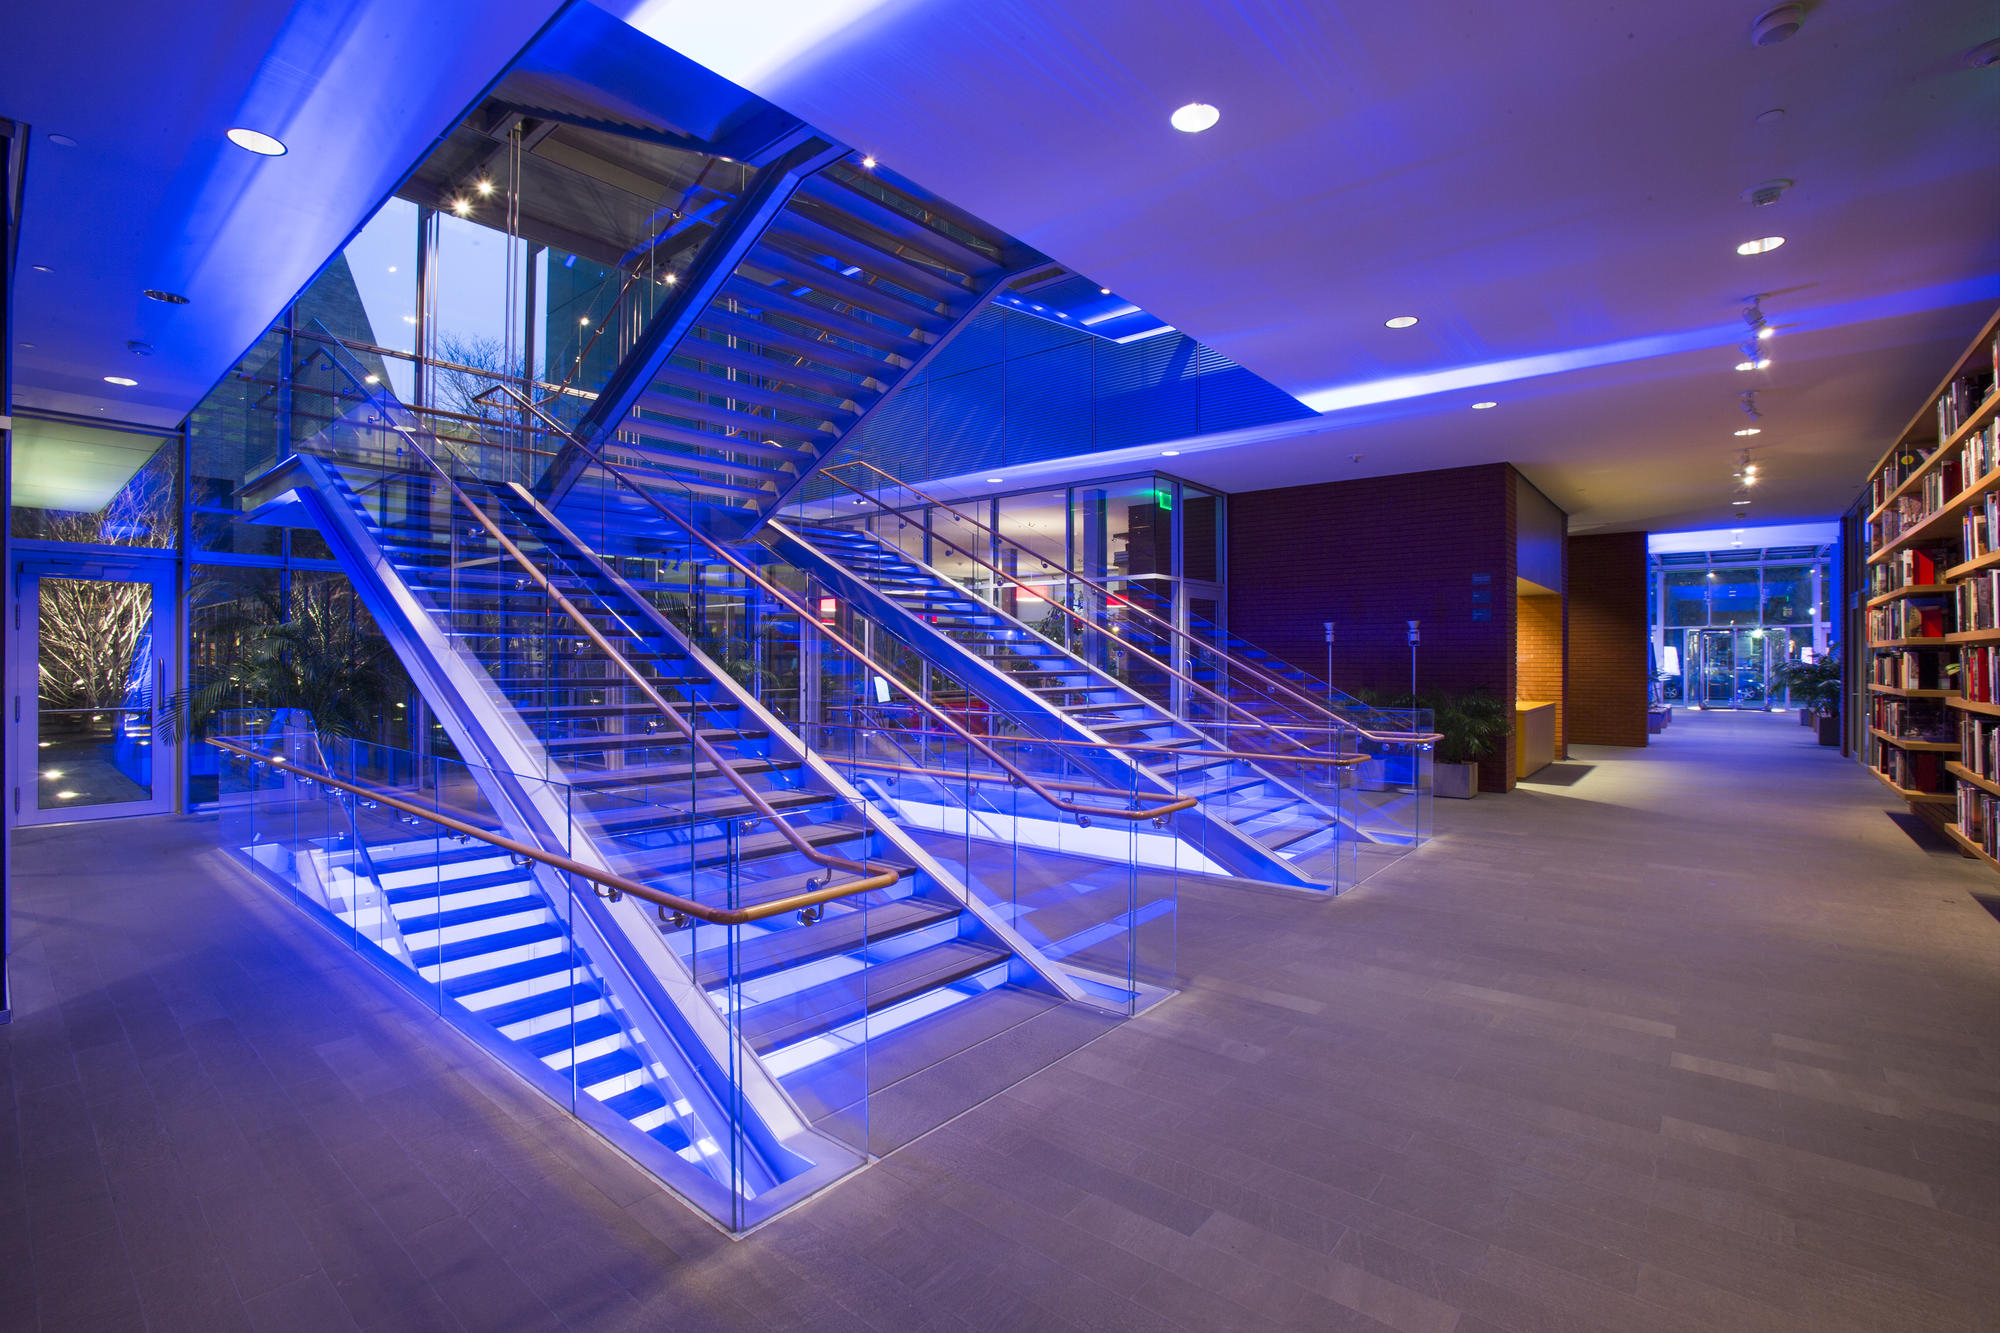 The New Wing Stairs, photo by Matt Teuten